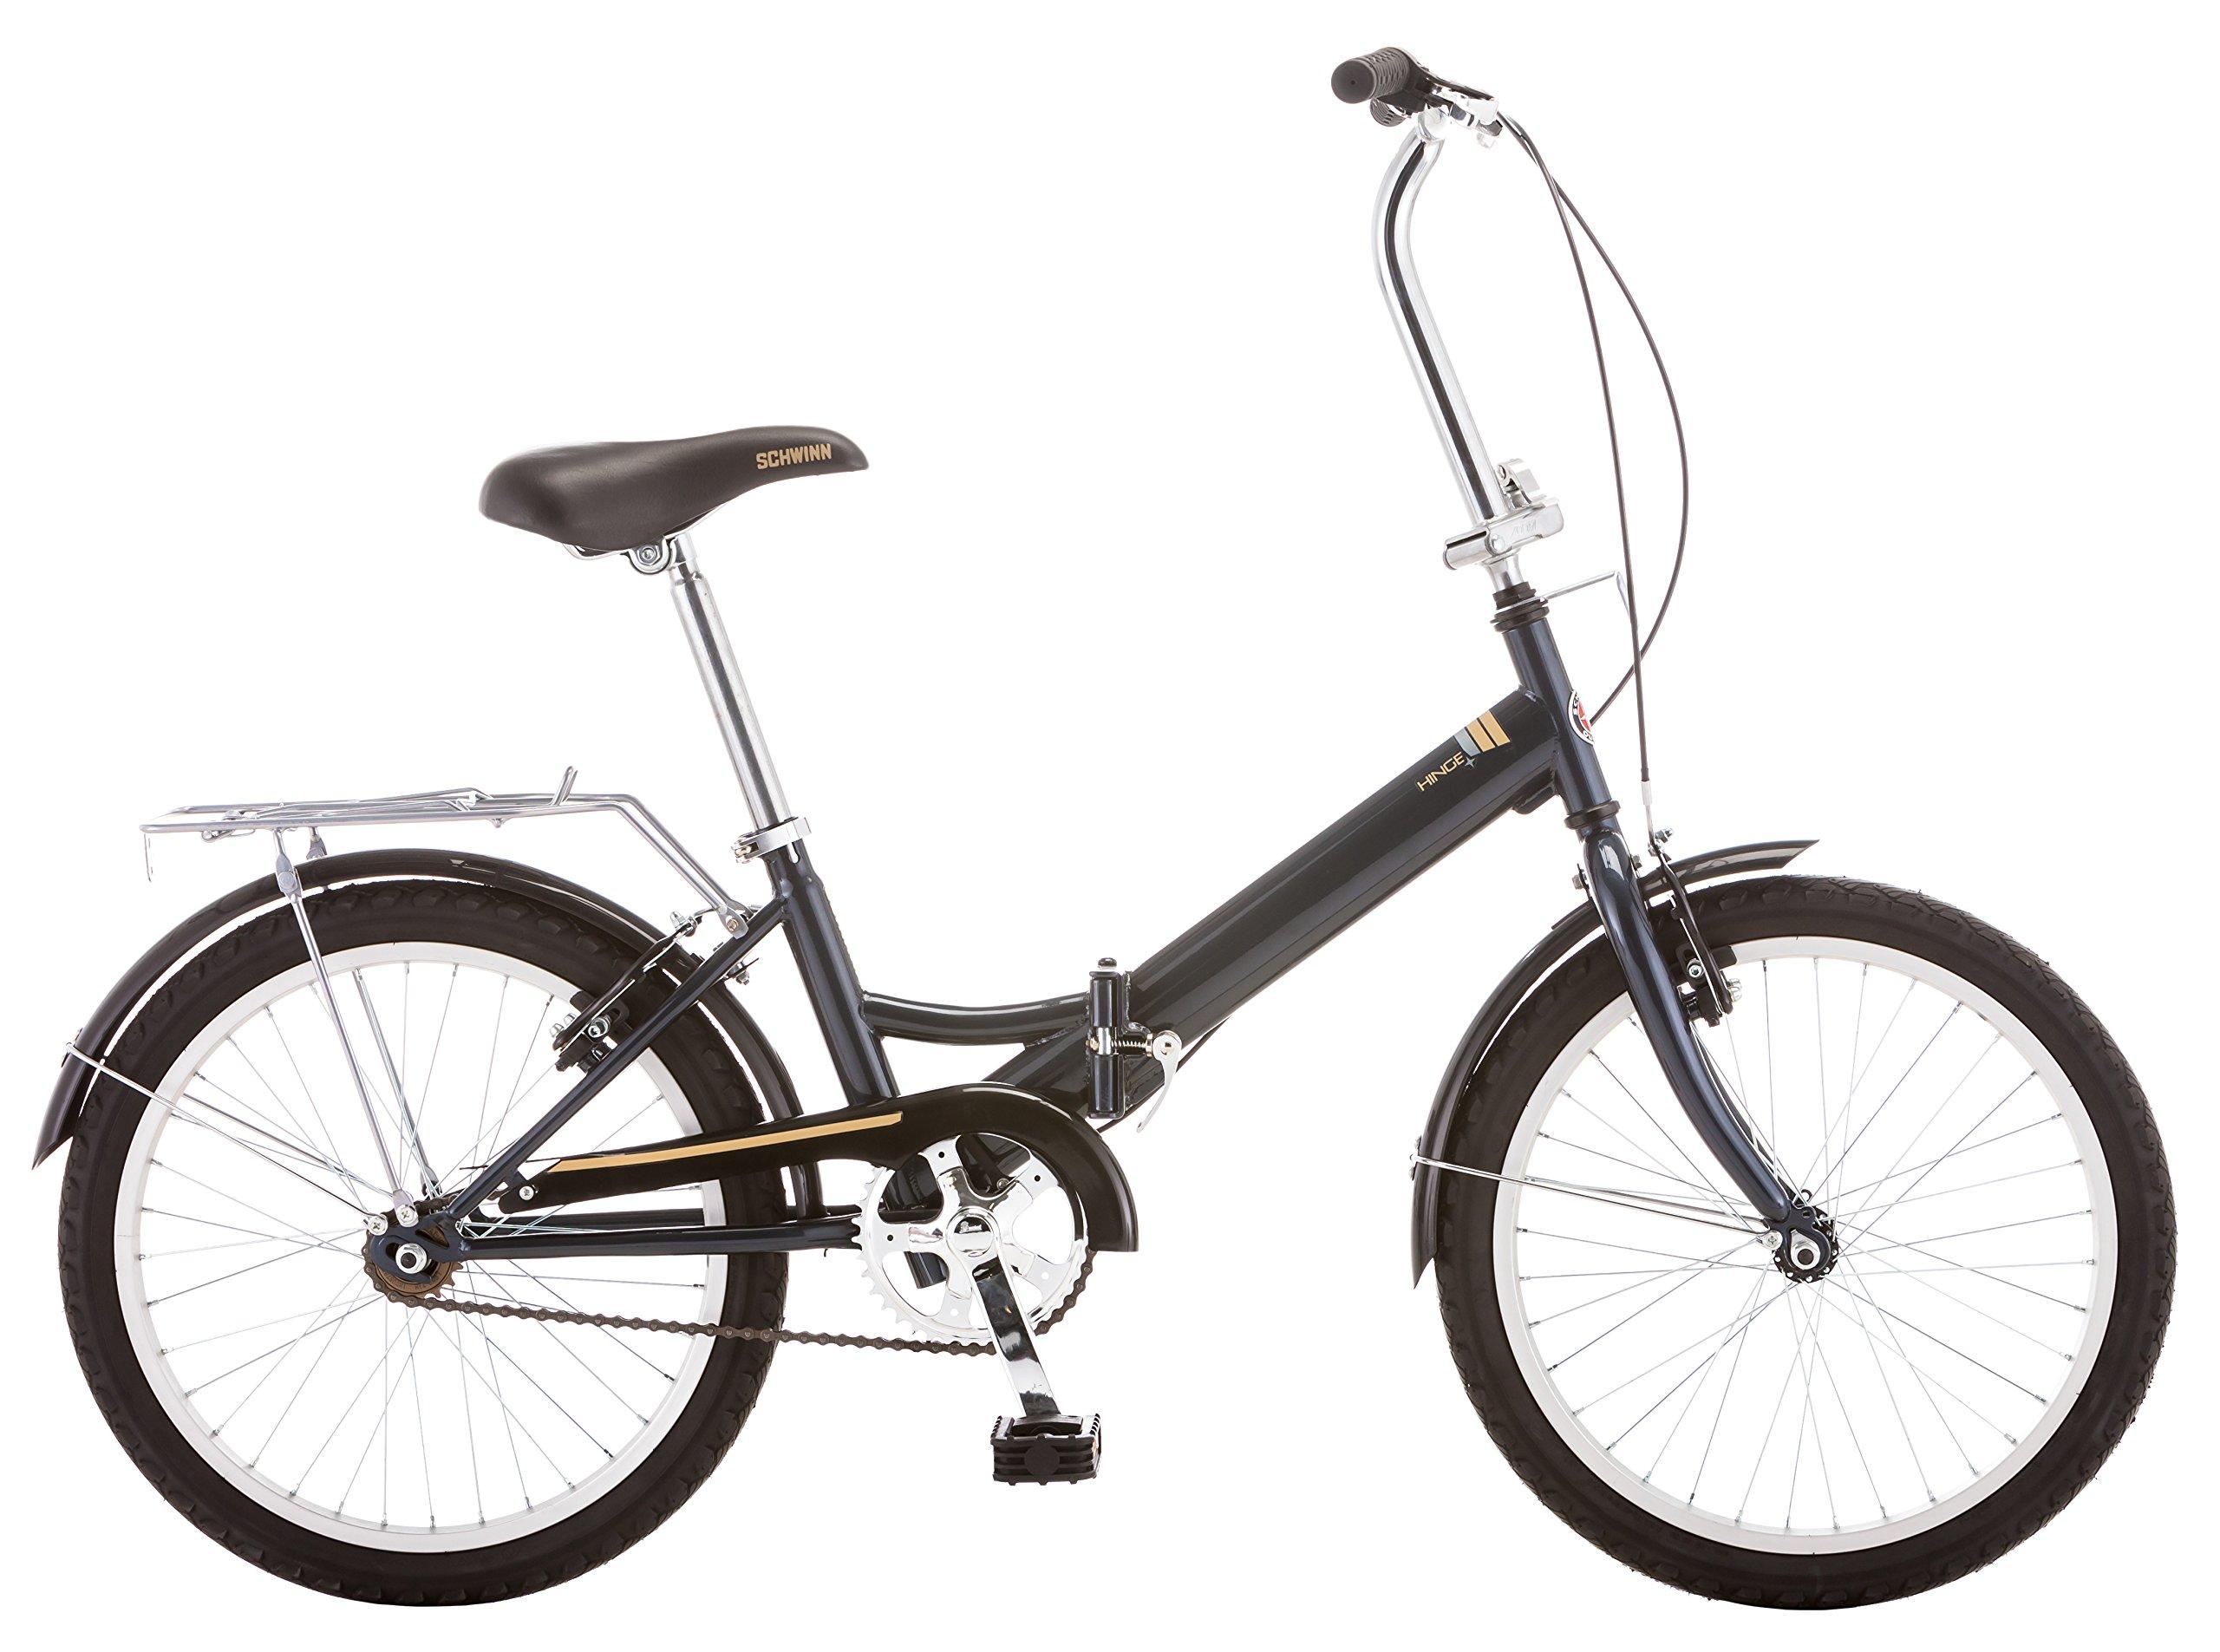 Schwinn 14 Hinge Folding Bike, 20-Inch/Medium, Grey by Schwinn (Image #2)